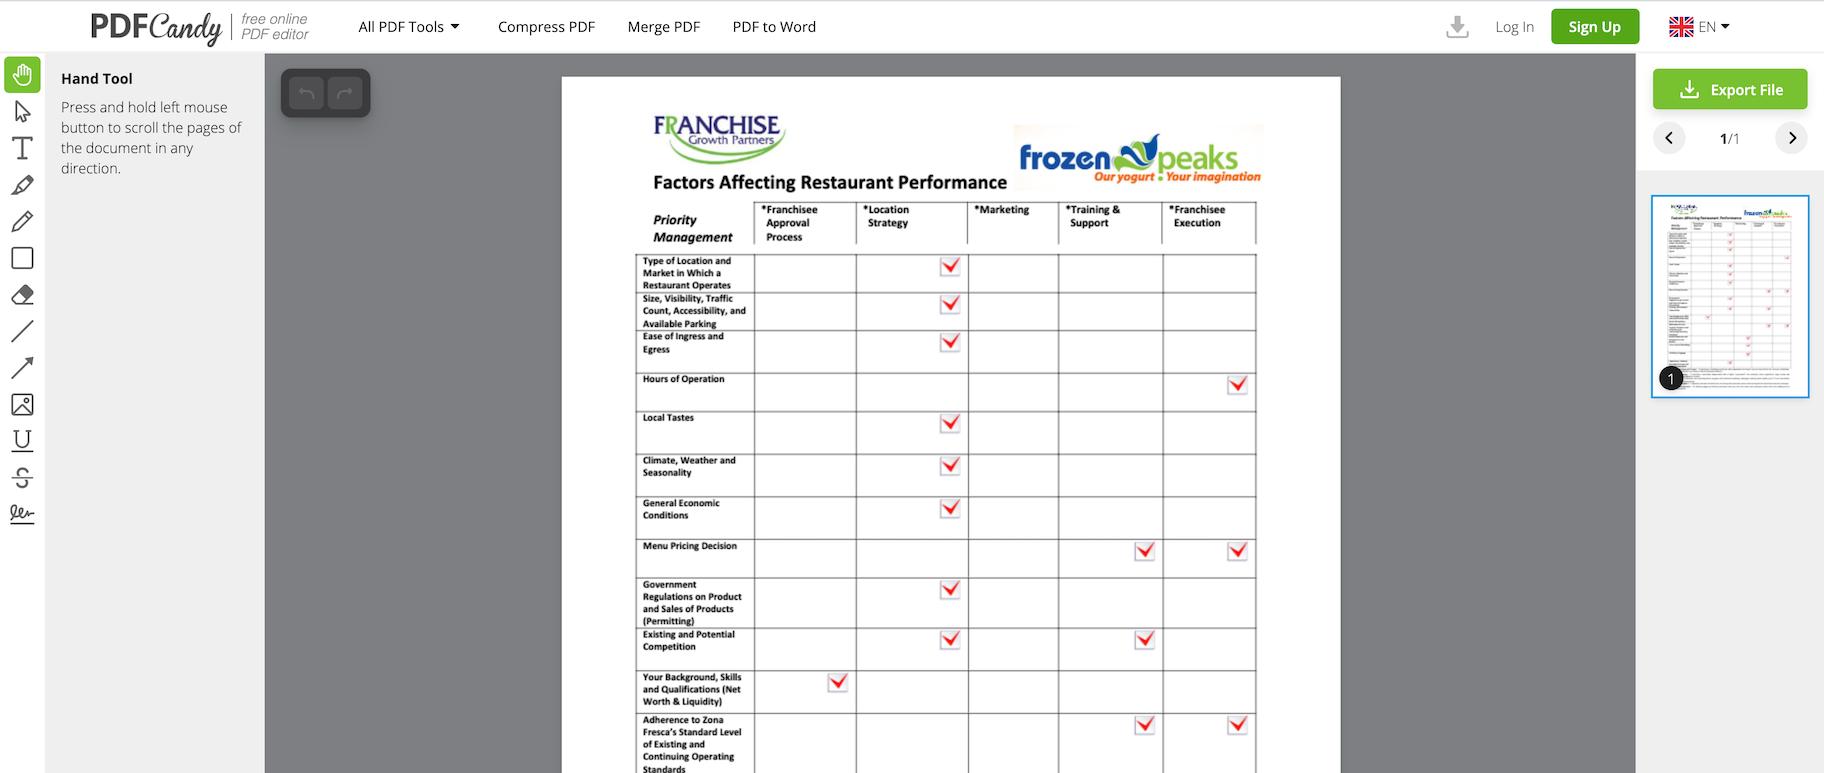 browser-based PDF editors